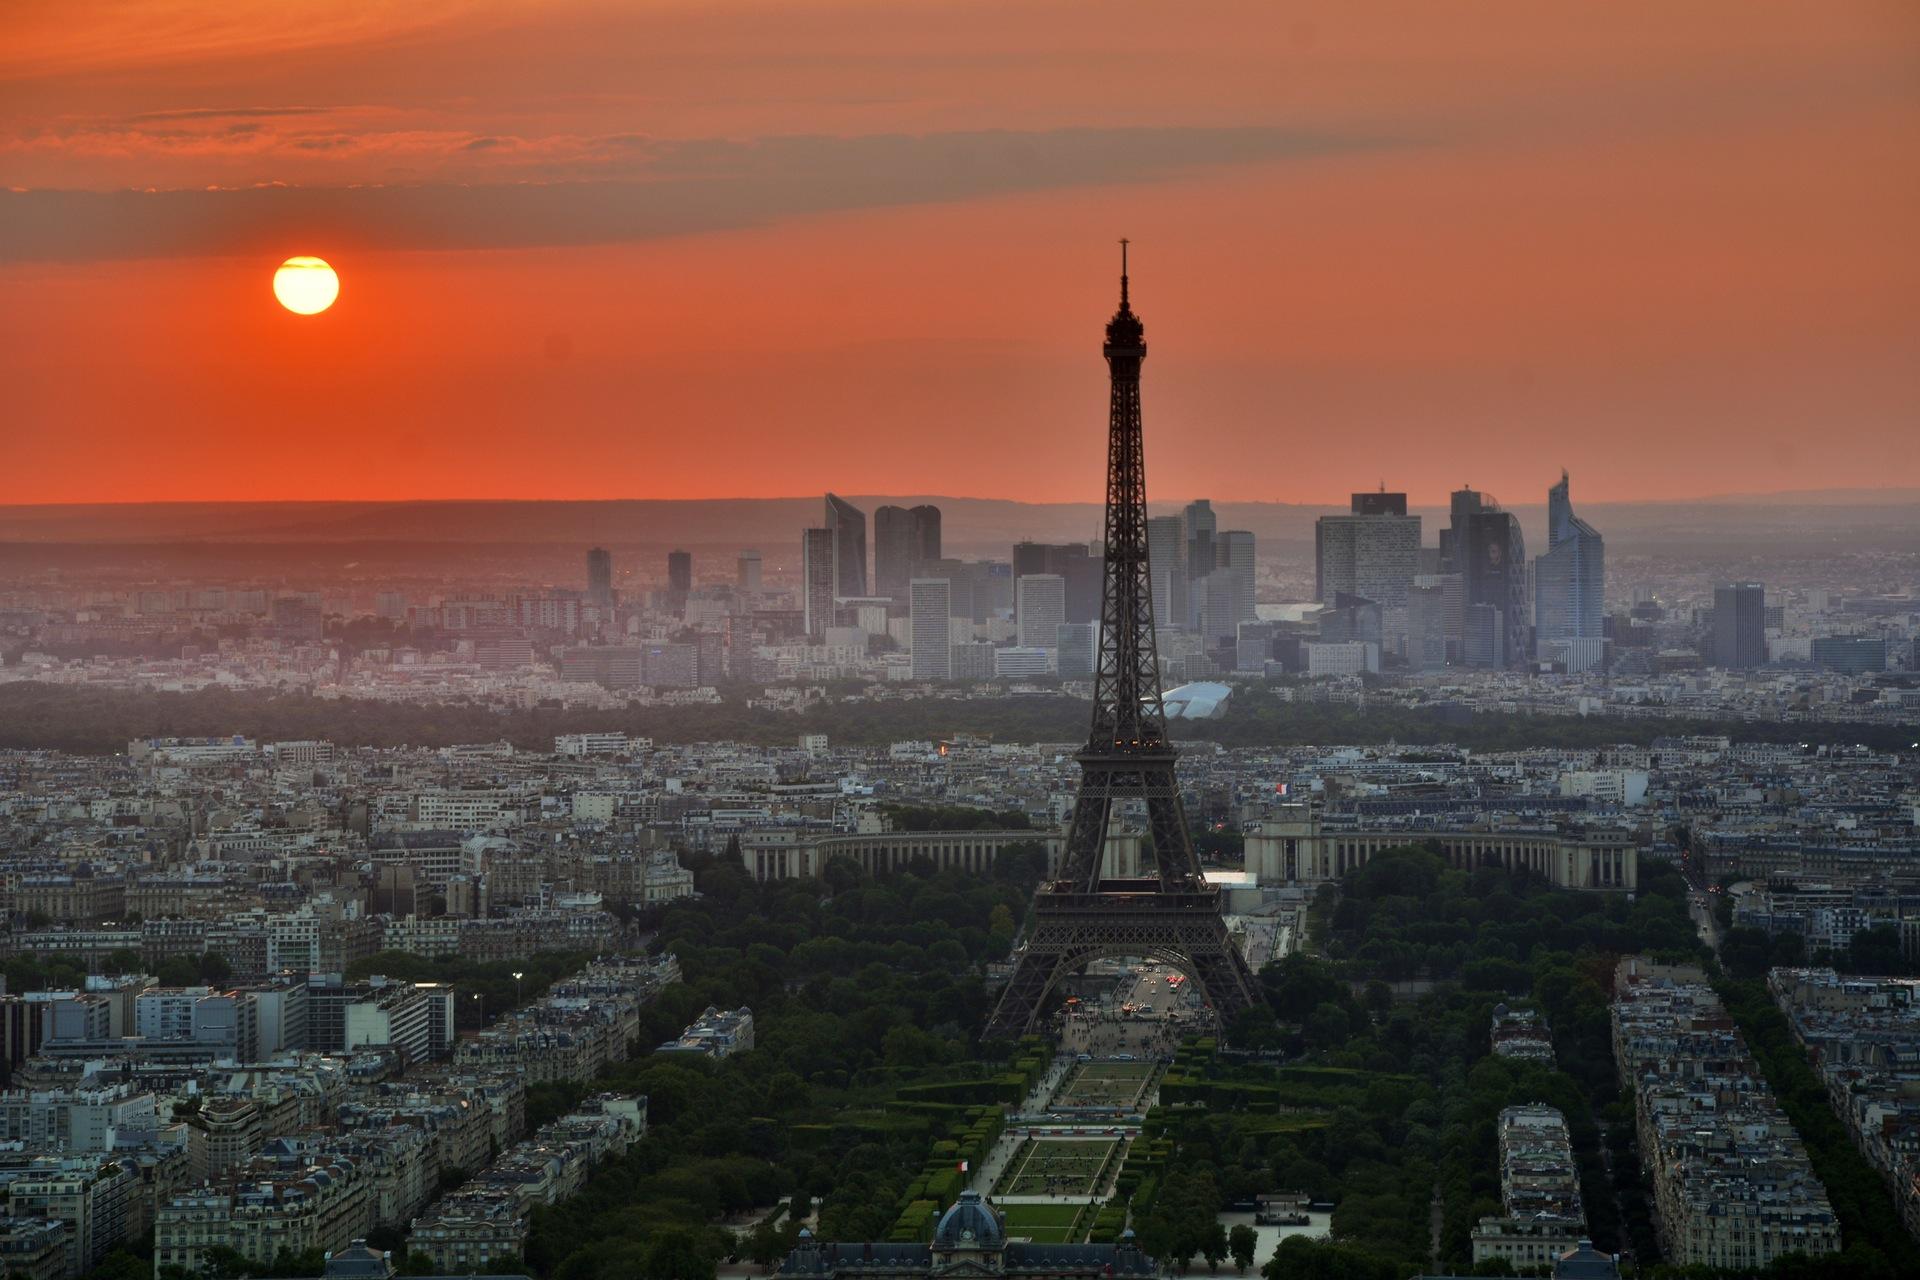 पेरिस, एफिल टॉवर, सूर्य, शहर, फ़्रांस - HD वॉलपेपर - प्रोफेसर-falken.com